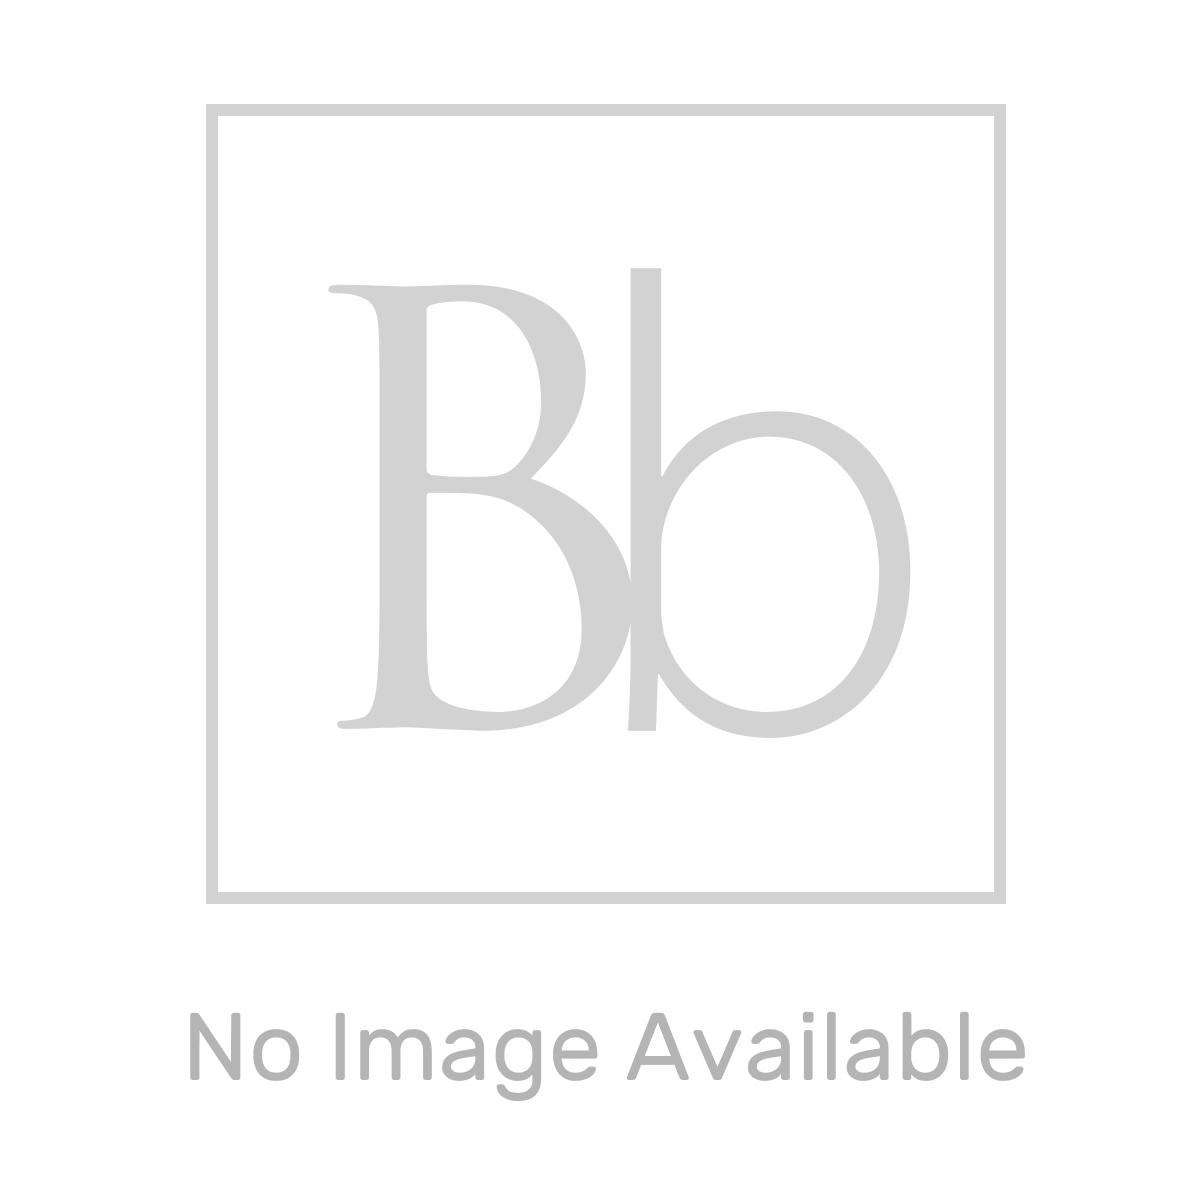 RAK Surface Dark Greige Lappato Tile 600 x 600mm